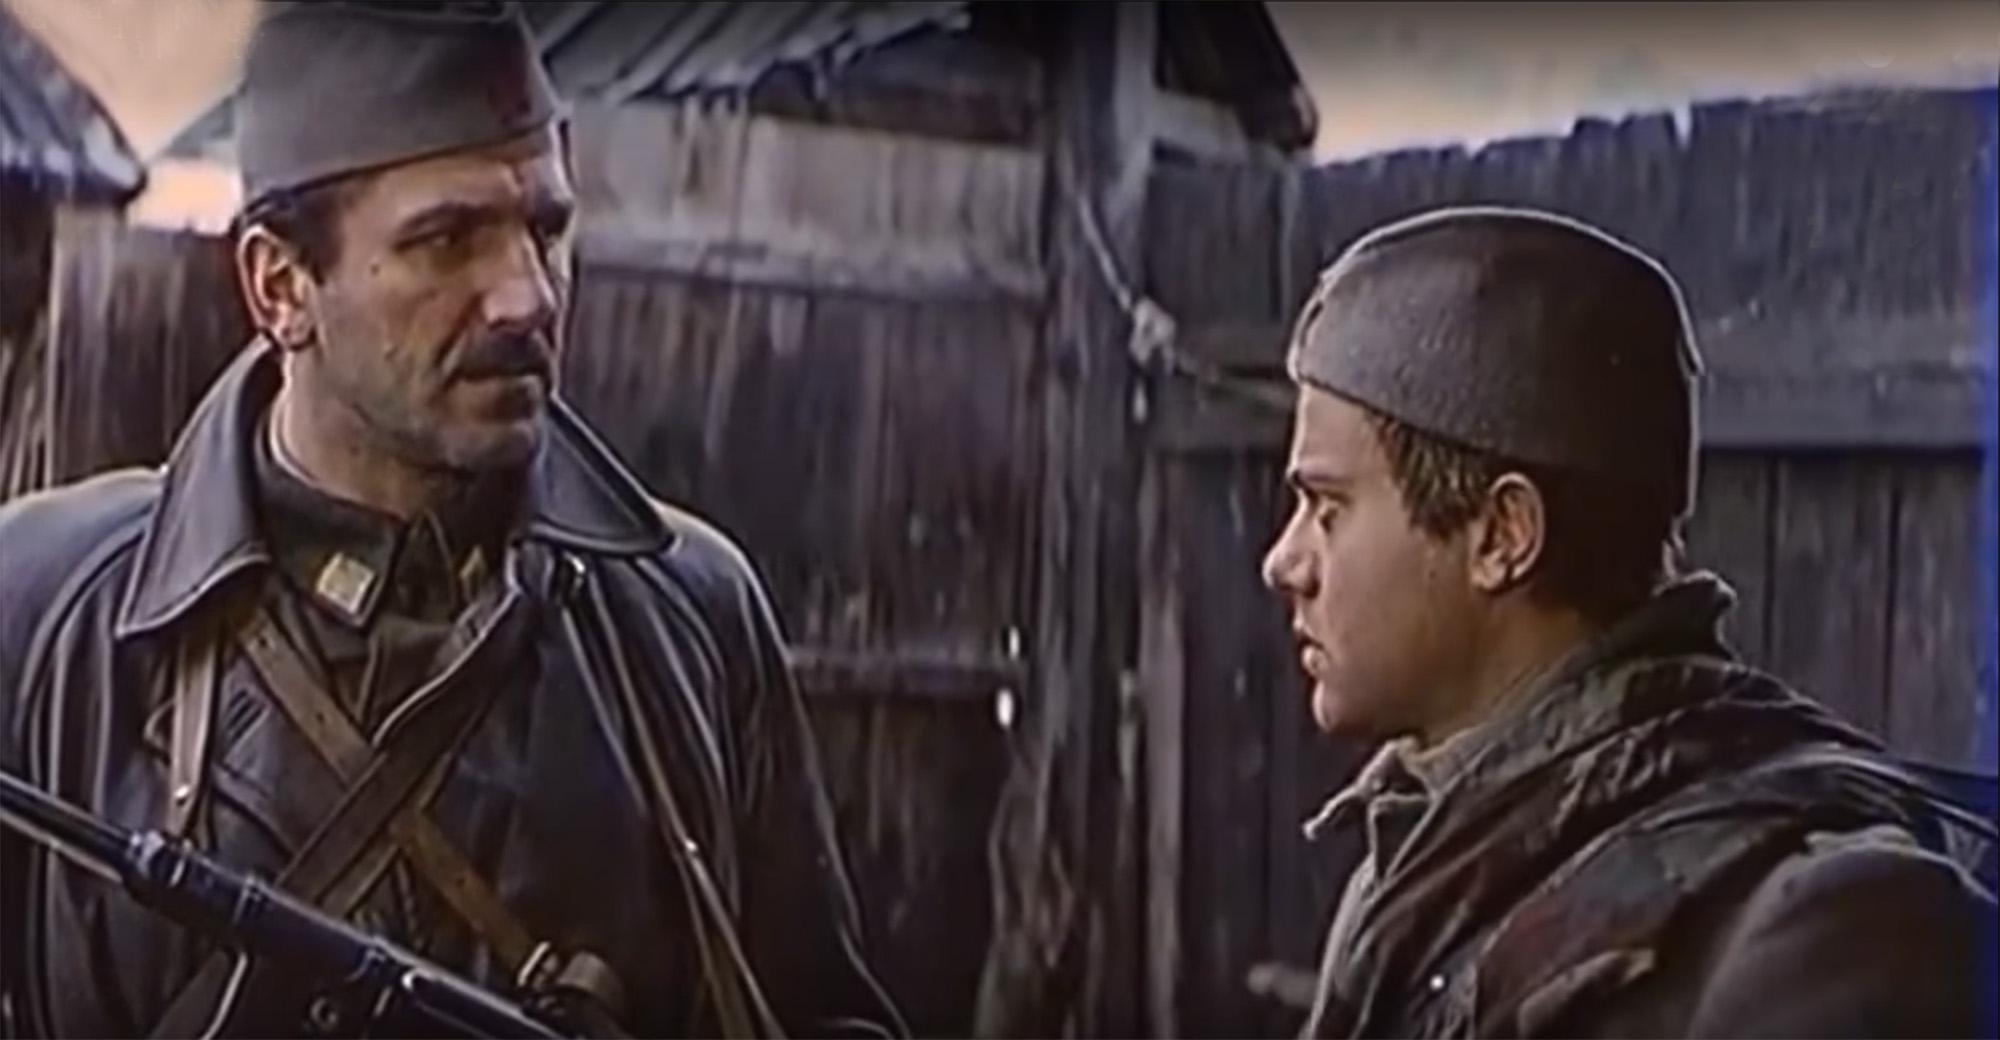 Nikola-Kole Angelovski and Velimir 'Bata' Zivojinovic in Bitka na Neretvi (1969)